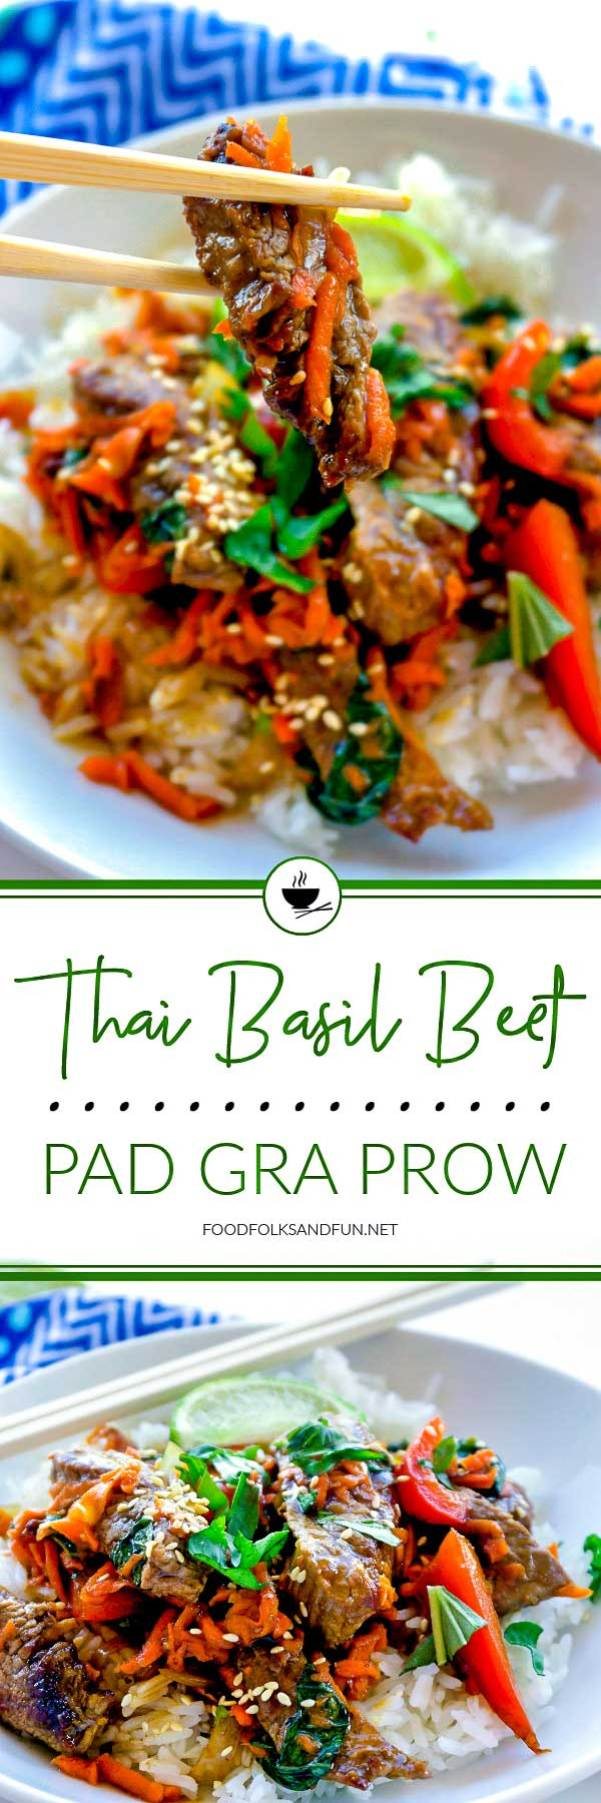 Thai Basil Beef - Pad Gra Prow